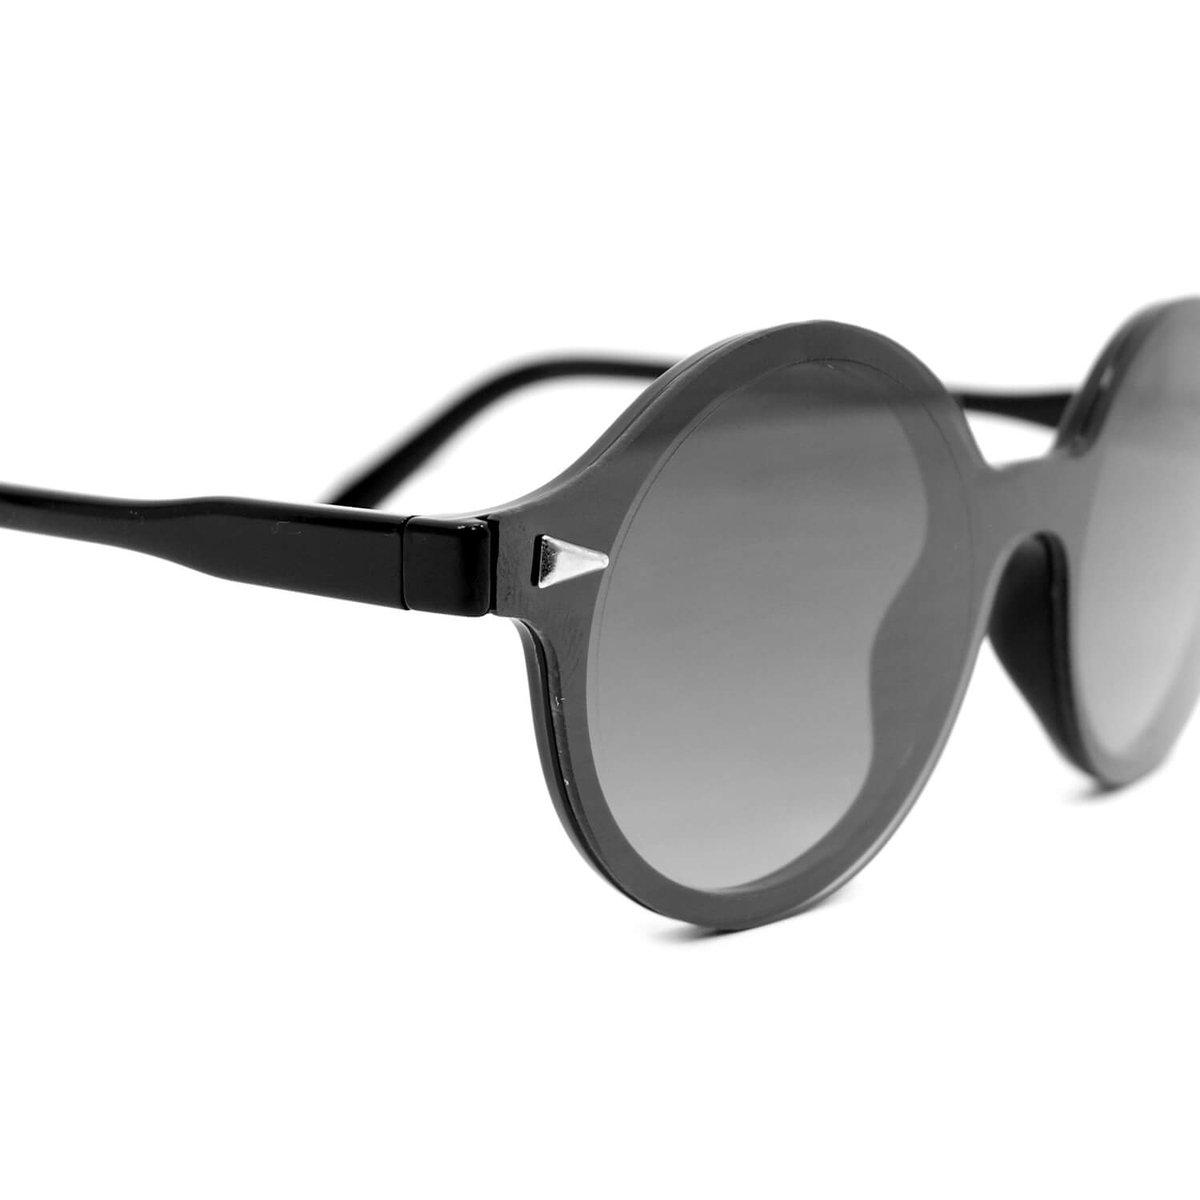 Óculos Bijoulux de Sol Redondo - Compre Agora   Zattini 23fac43855